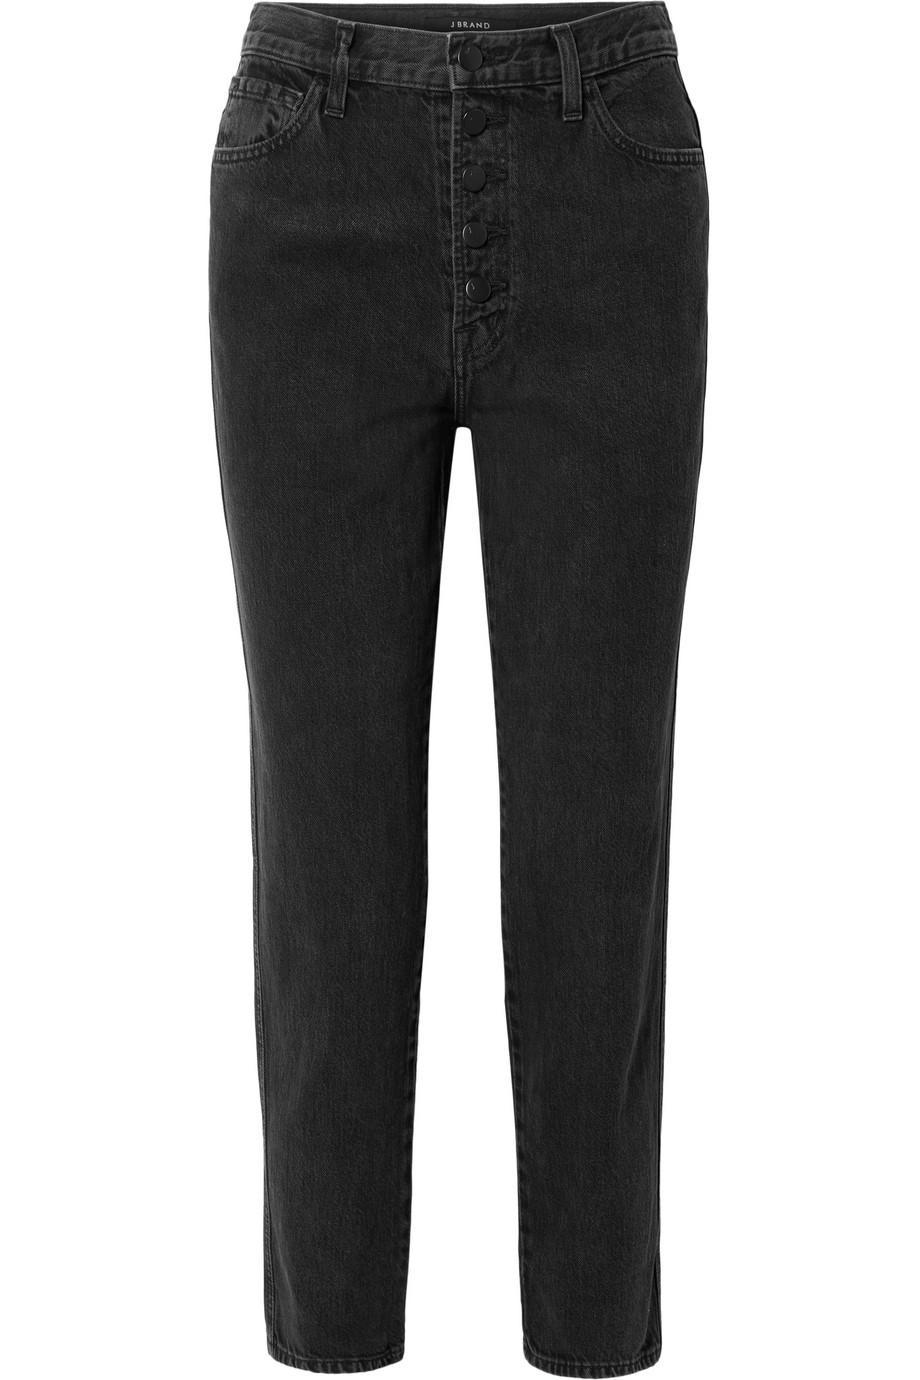 Heather Cropped High-rise Straight-leg Jeans - Black J Brand oYYyrn